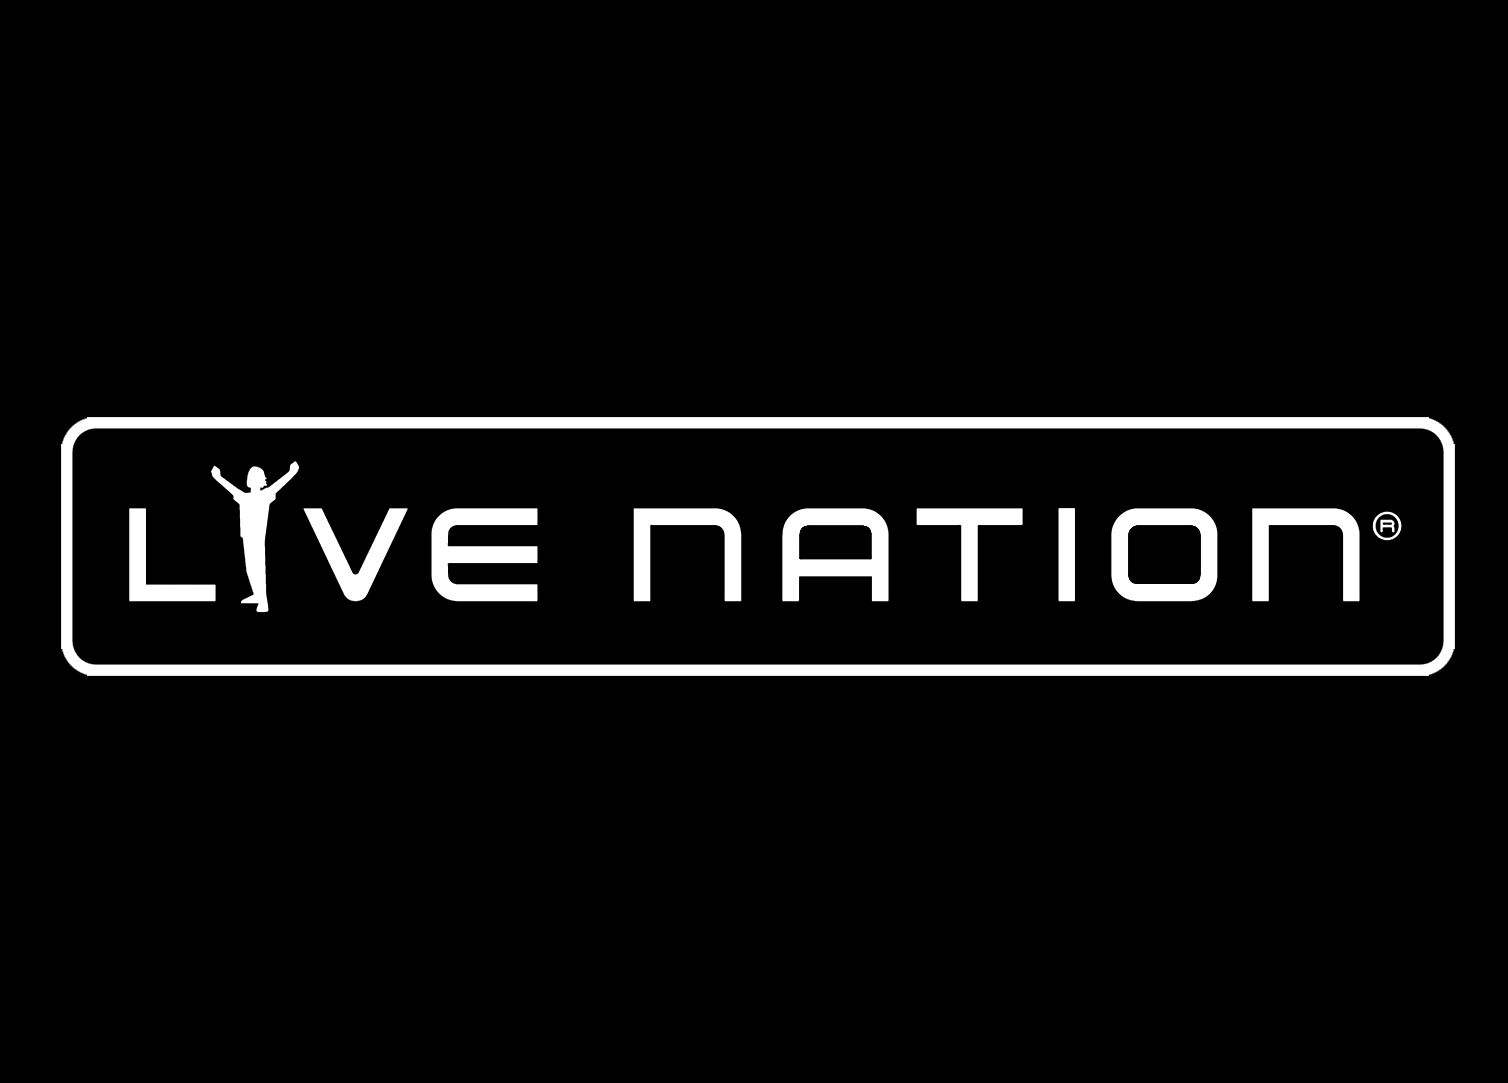 Livenation_TheSyndicate_Marketing.jpg